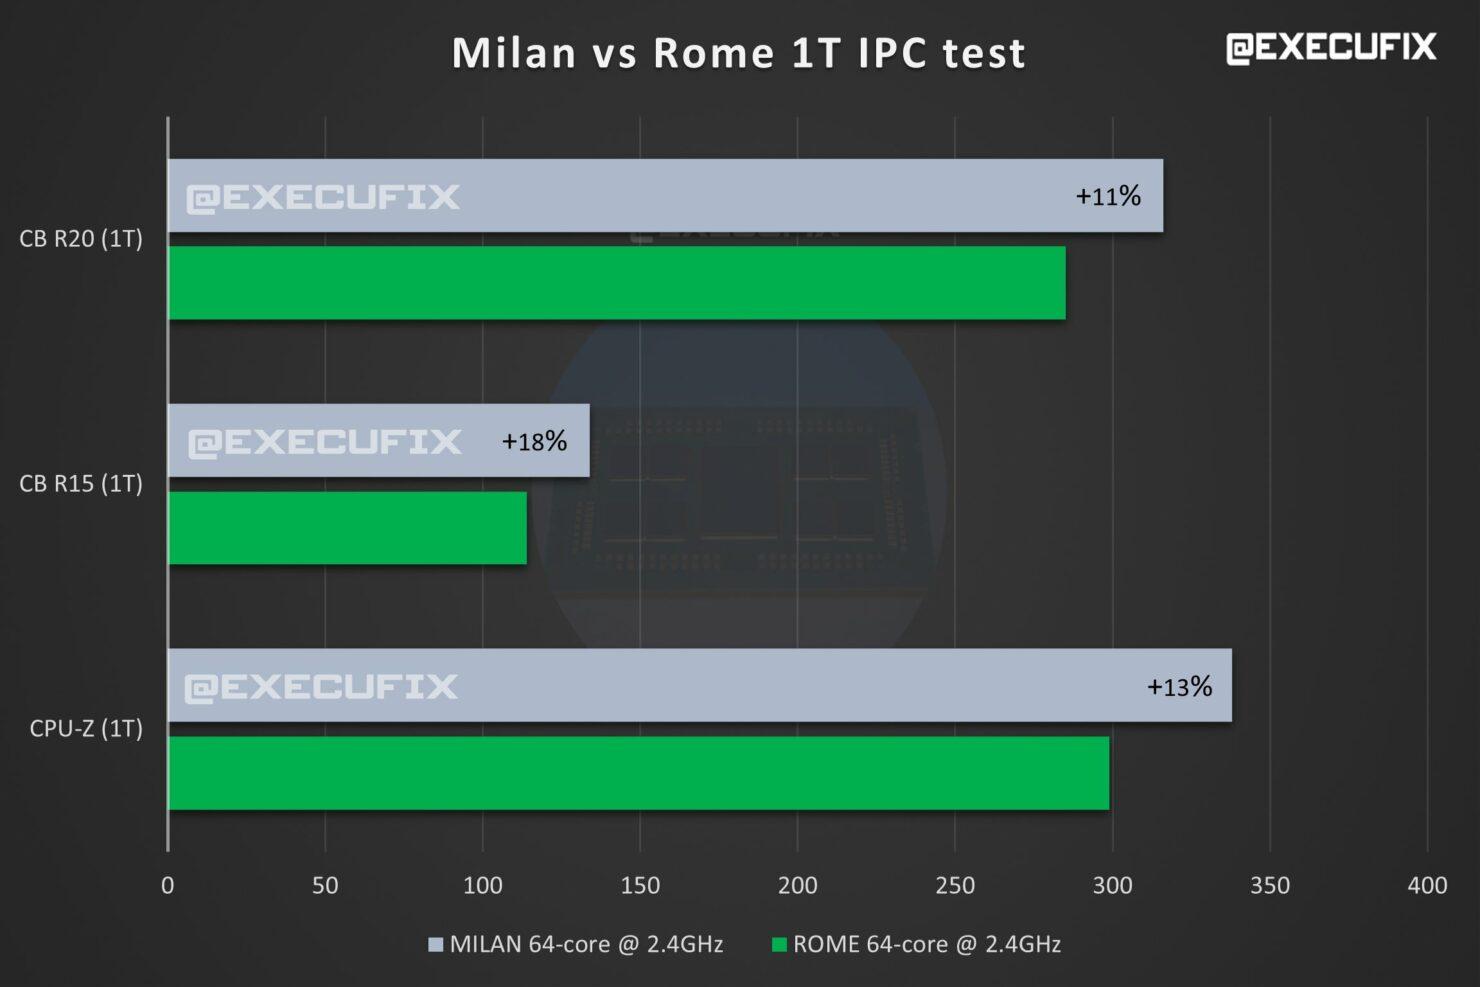 amd-epyc-milan-64-core-cpu-benchmarks-vs-epyc-rome-64-core-cpus_-ipc